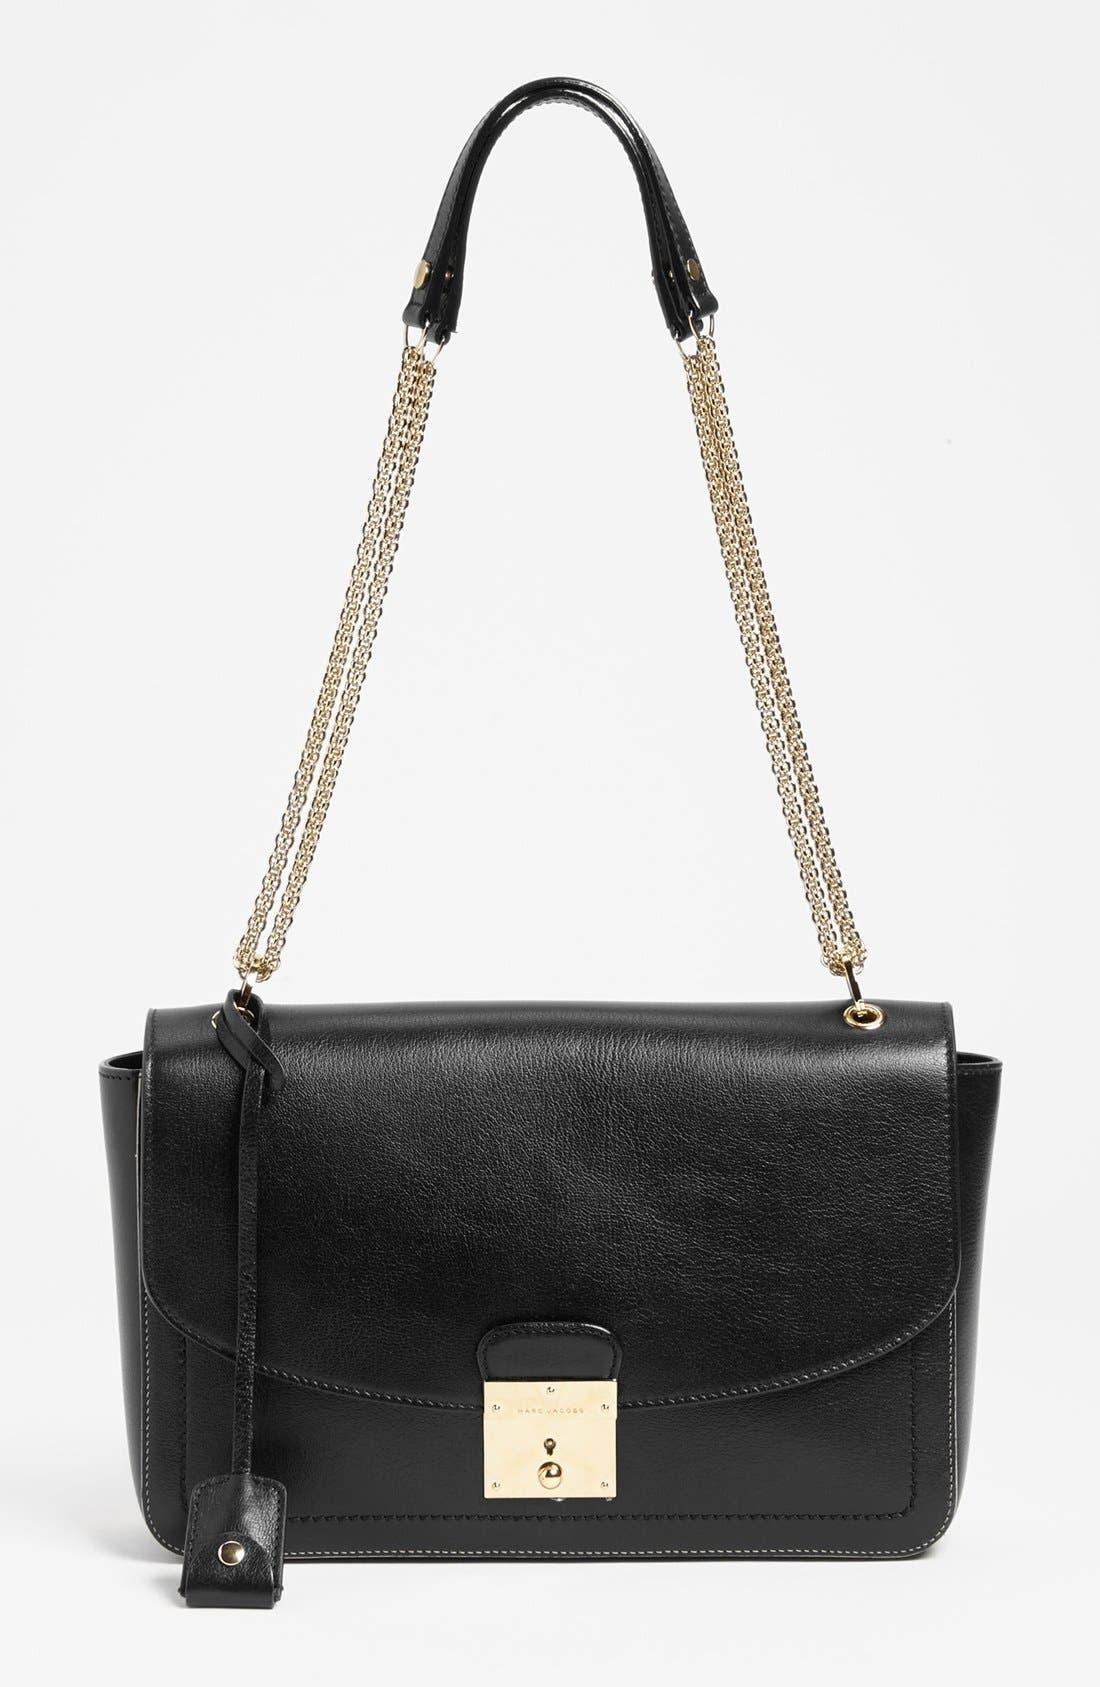 Alternate Image 1 Selected - MARC JACOBS '1984 Polly' Leather Shoulder Bag